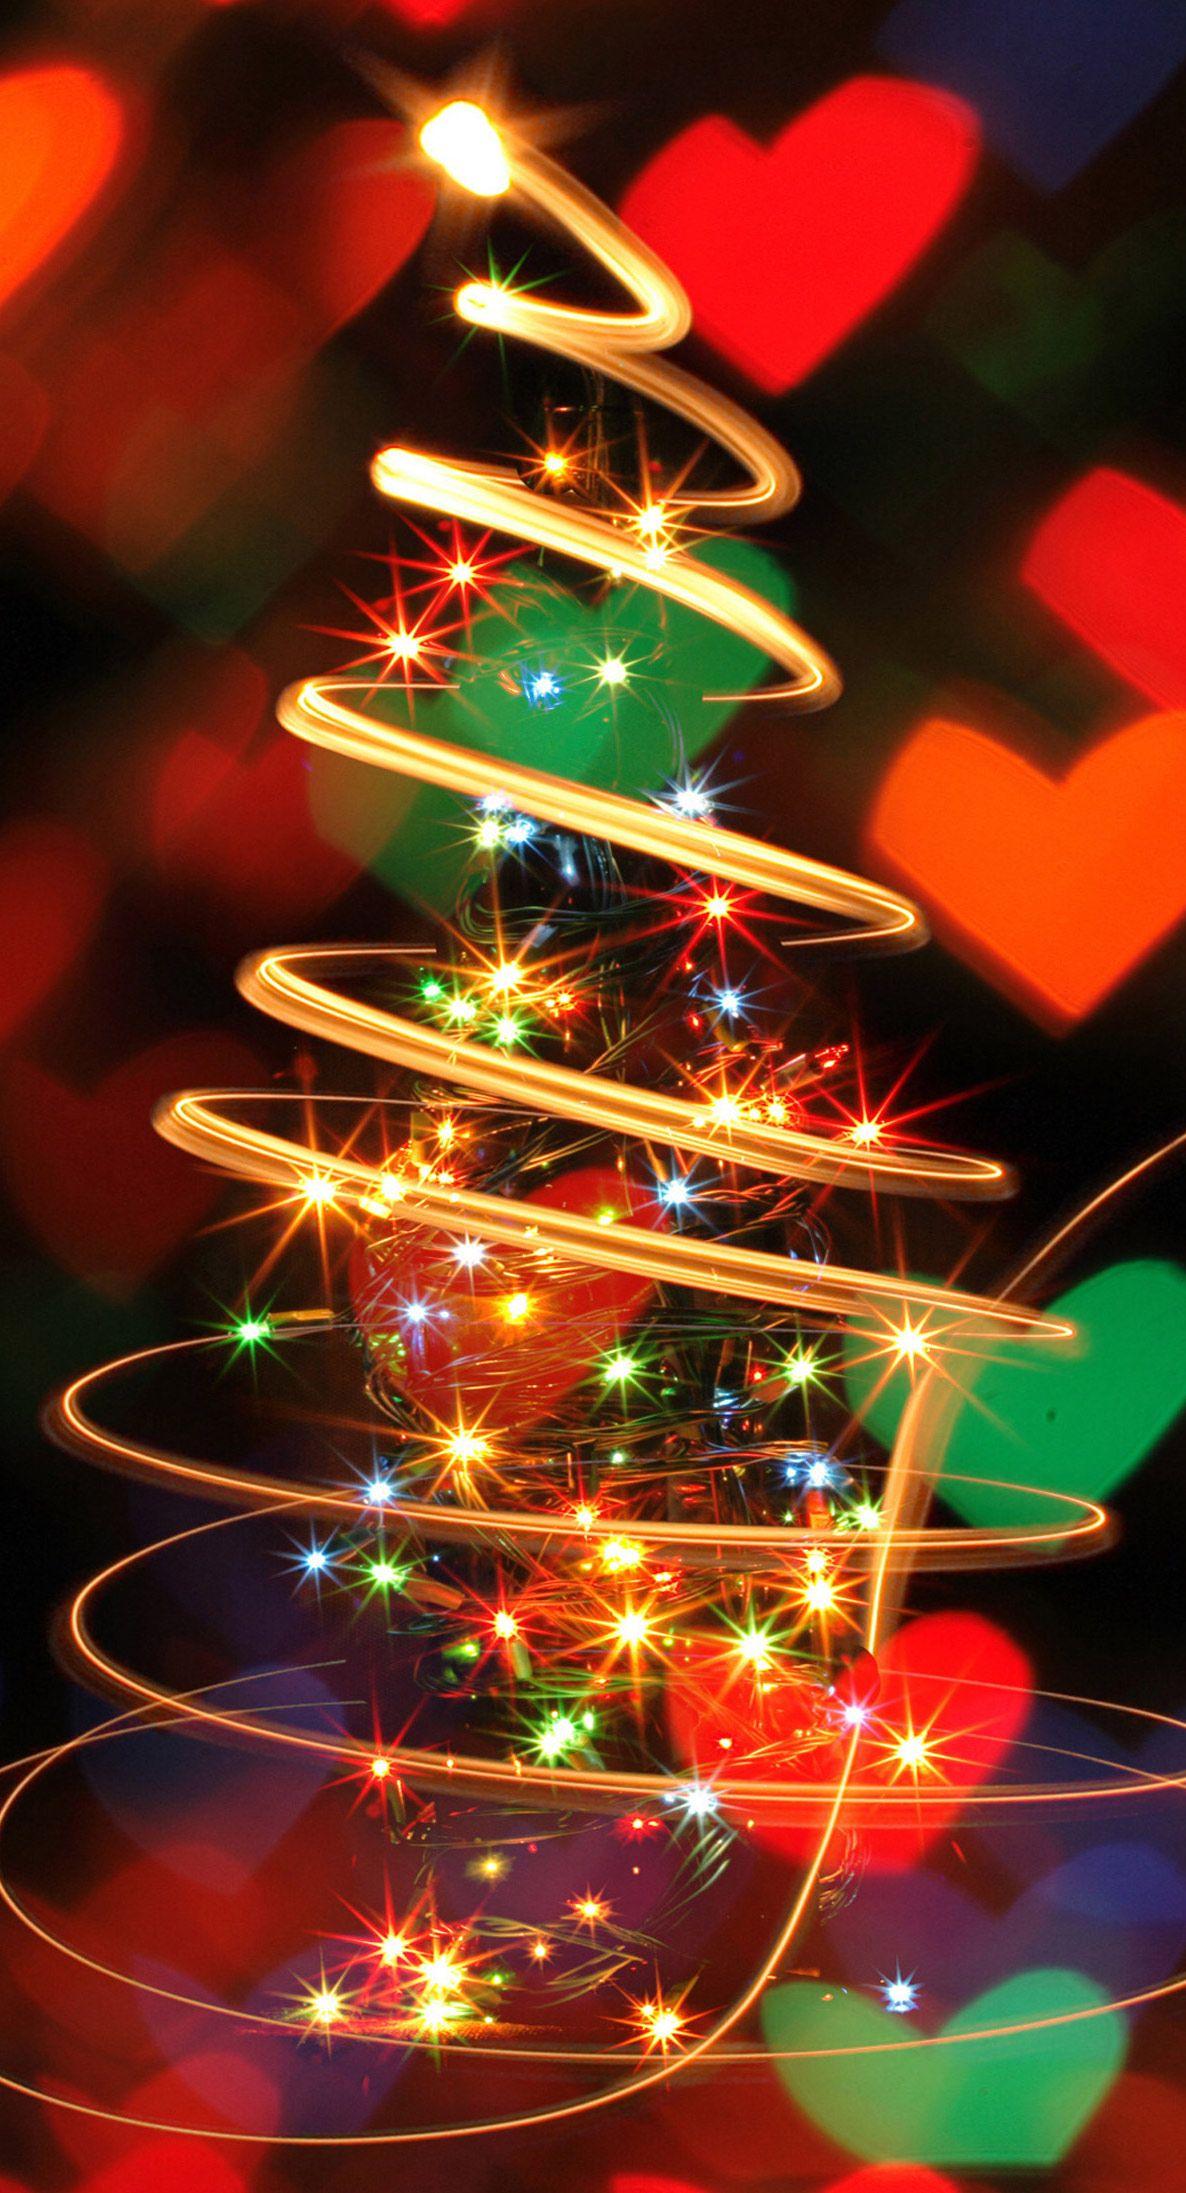 Christmas HD and Widescreen Wallpapers Christmas Love